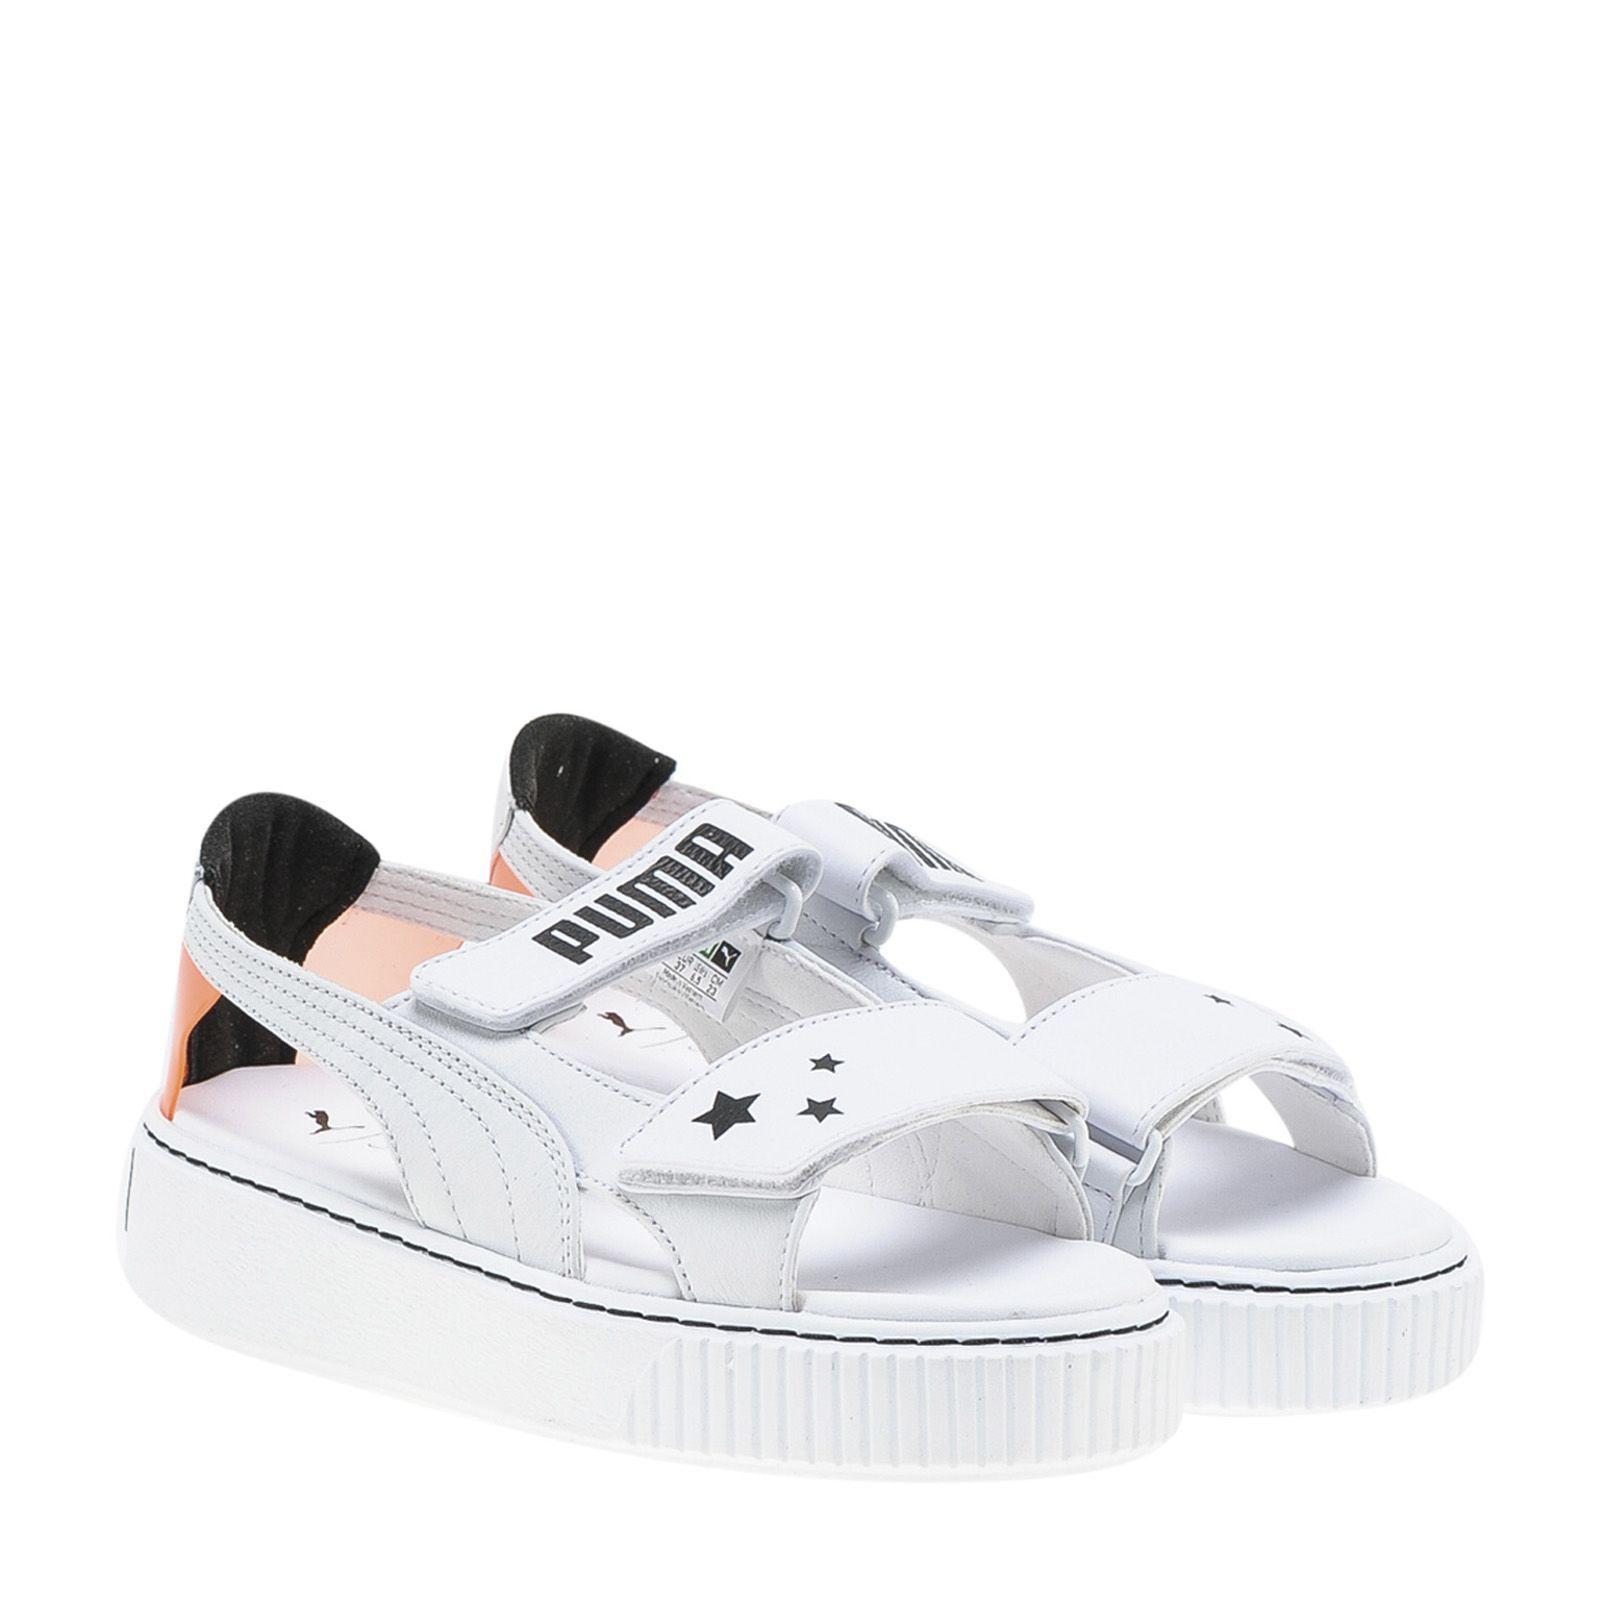 f8dd7c3f17f212 SOPHIA WEBSTER X PUMA PUMA X SOPHIA WEBSTER OPEN TOE STRAP SNEAKERS.   sophiawebsterxpuma  shoes